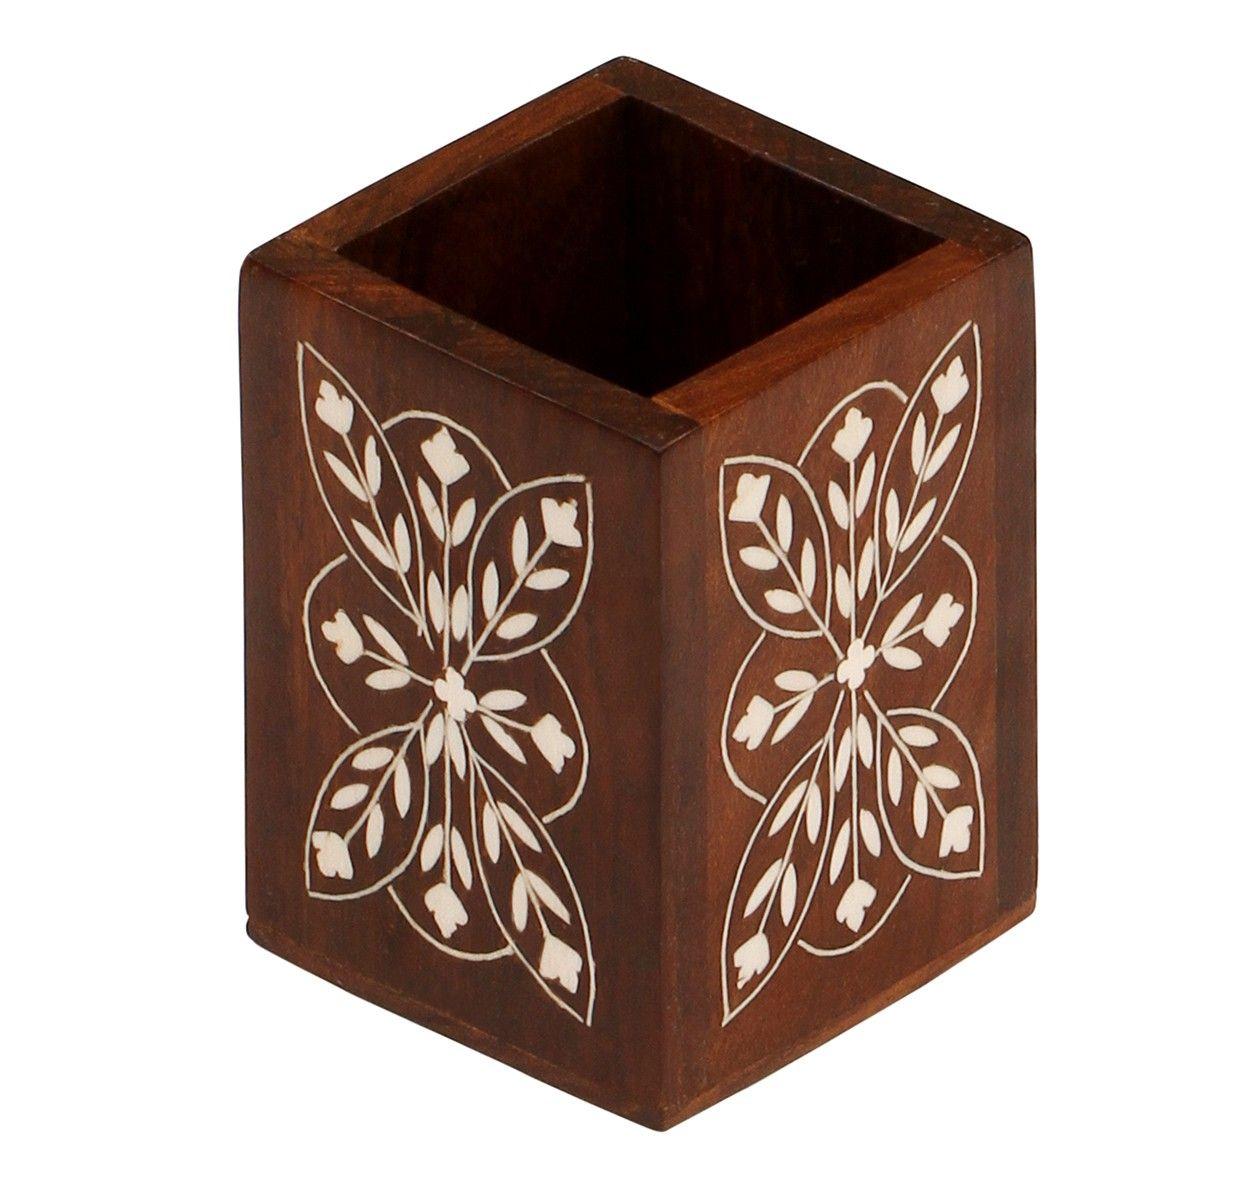 Bulk Wholesale Handmade Wooden Pen Stand / Holder / Organizer with Floral  Latticework Carving – Desk